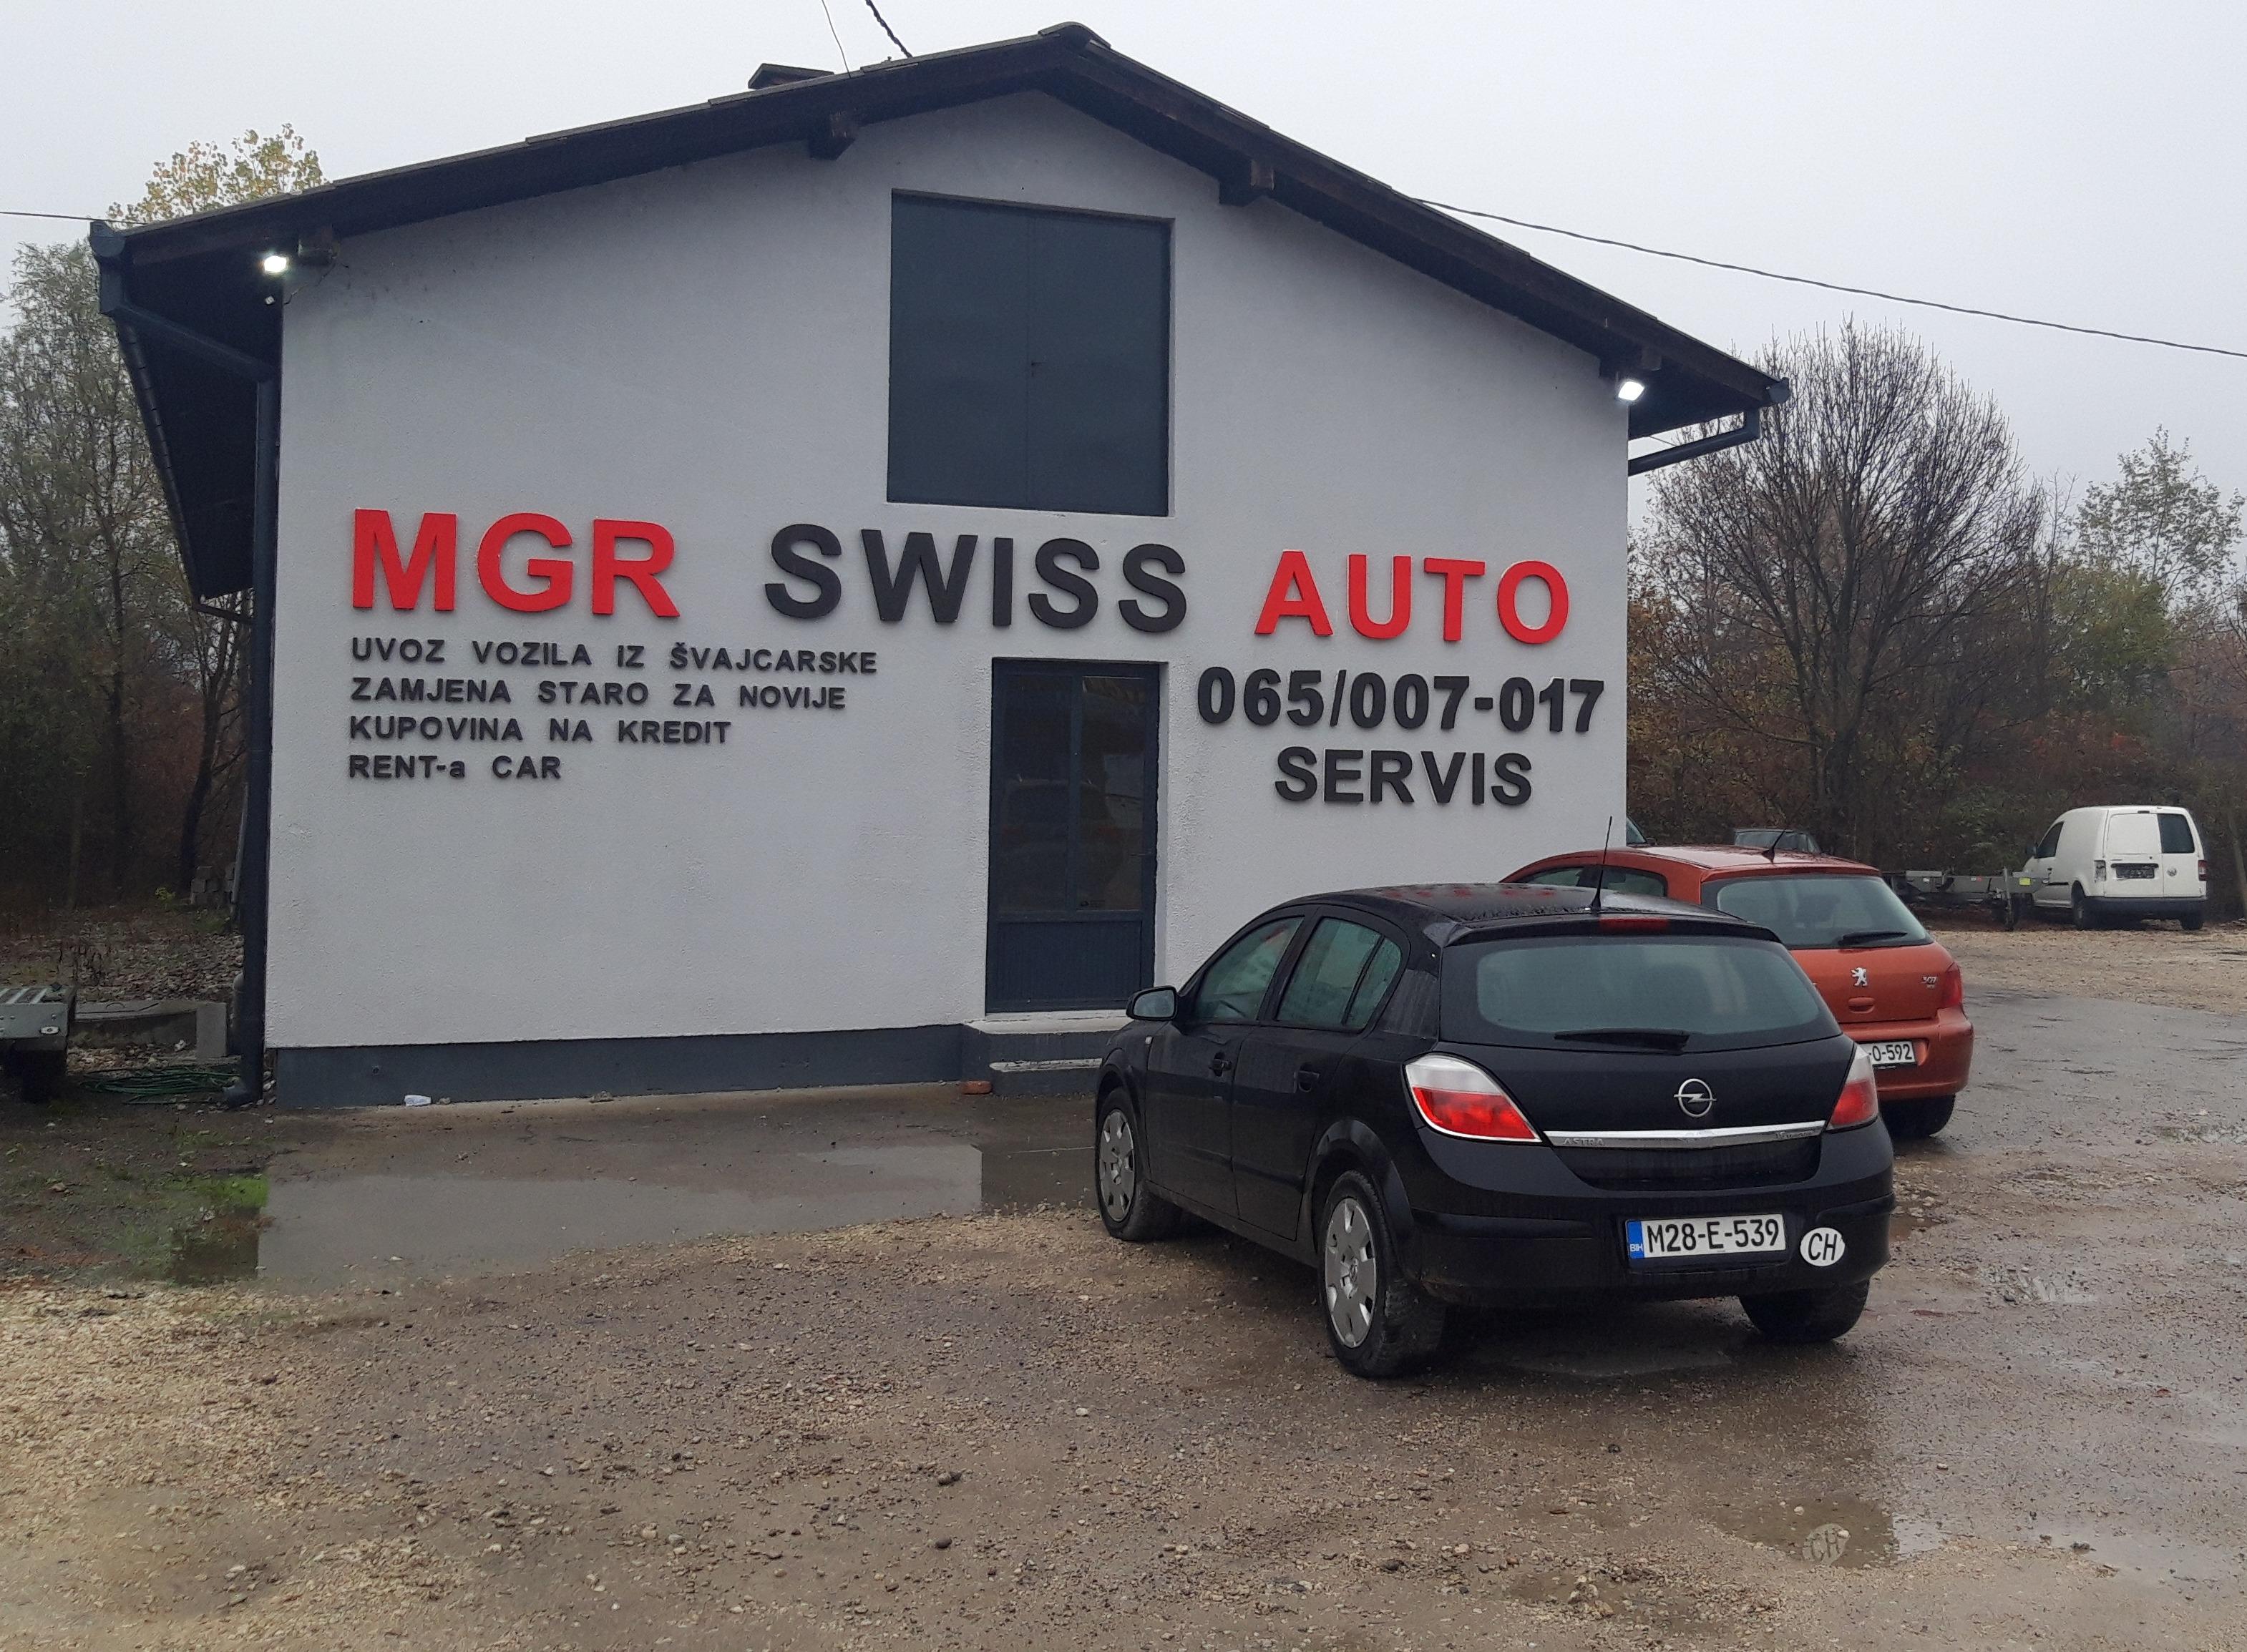 Mgr Swiss Auto photo-0